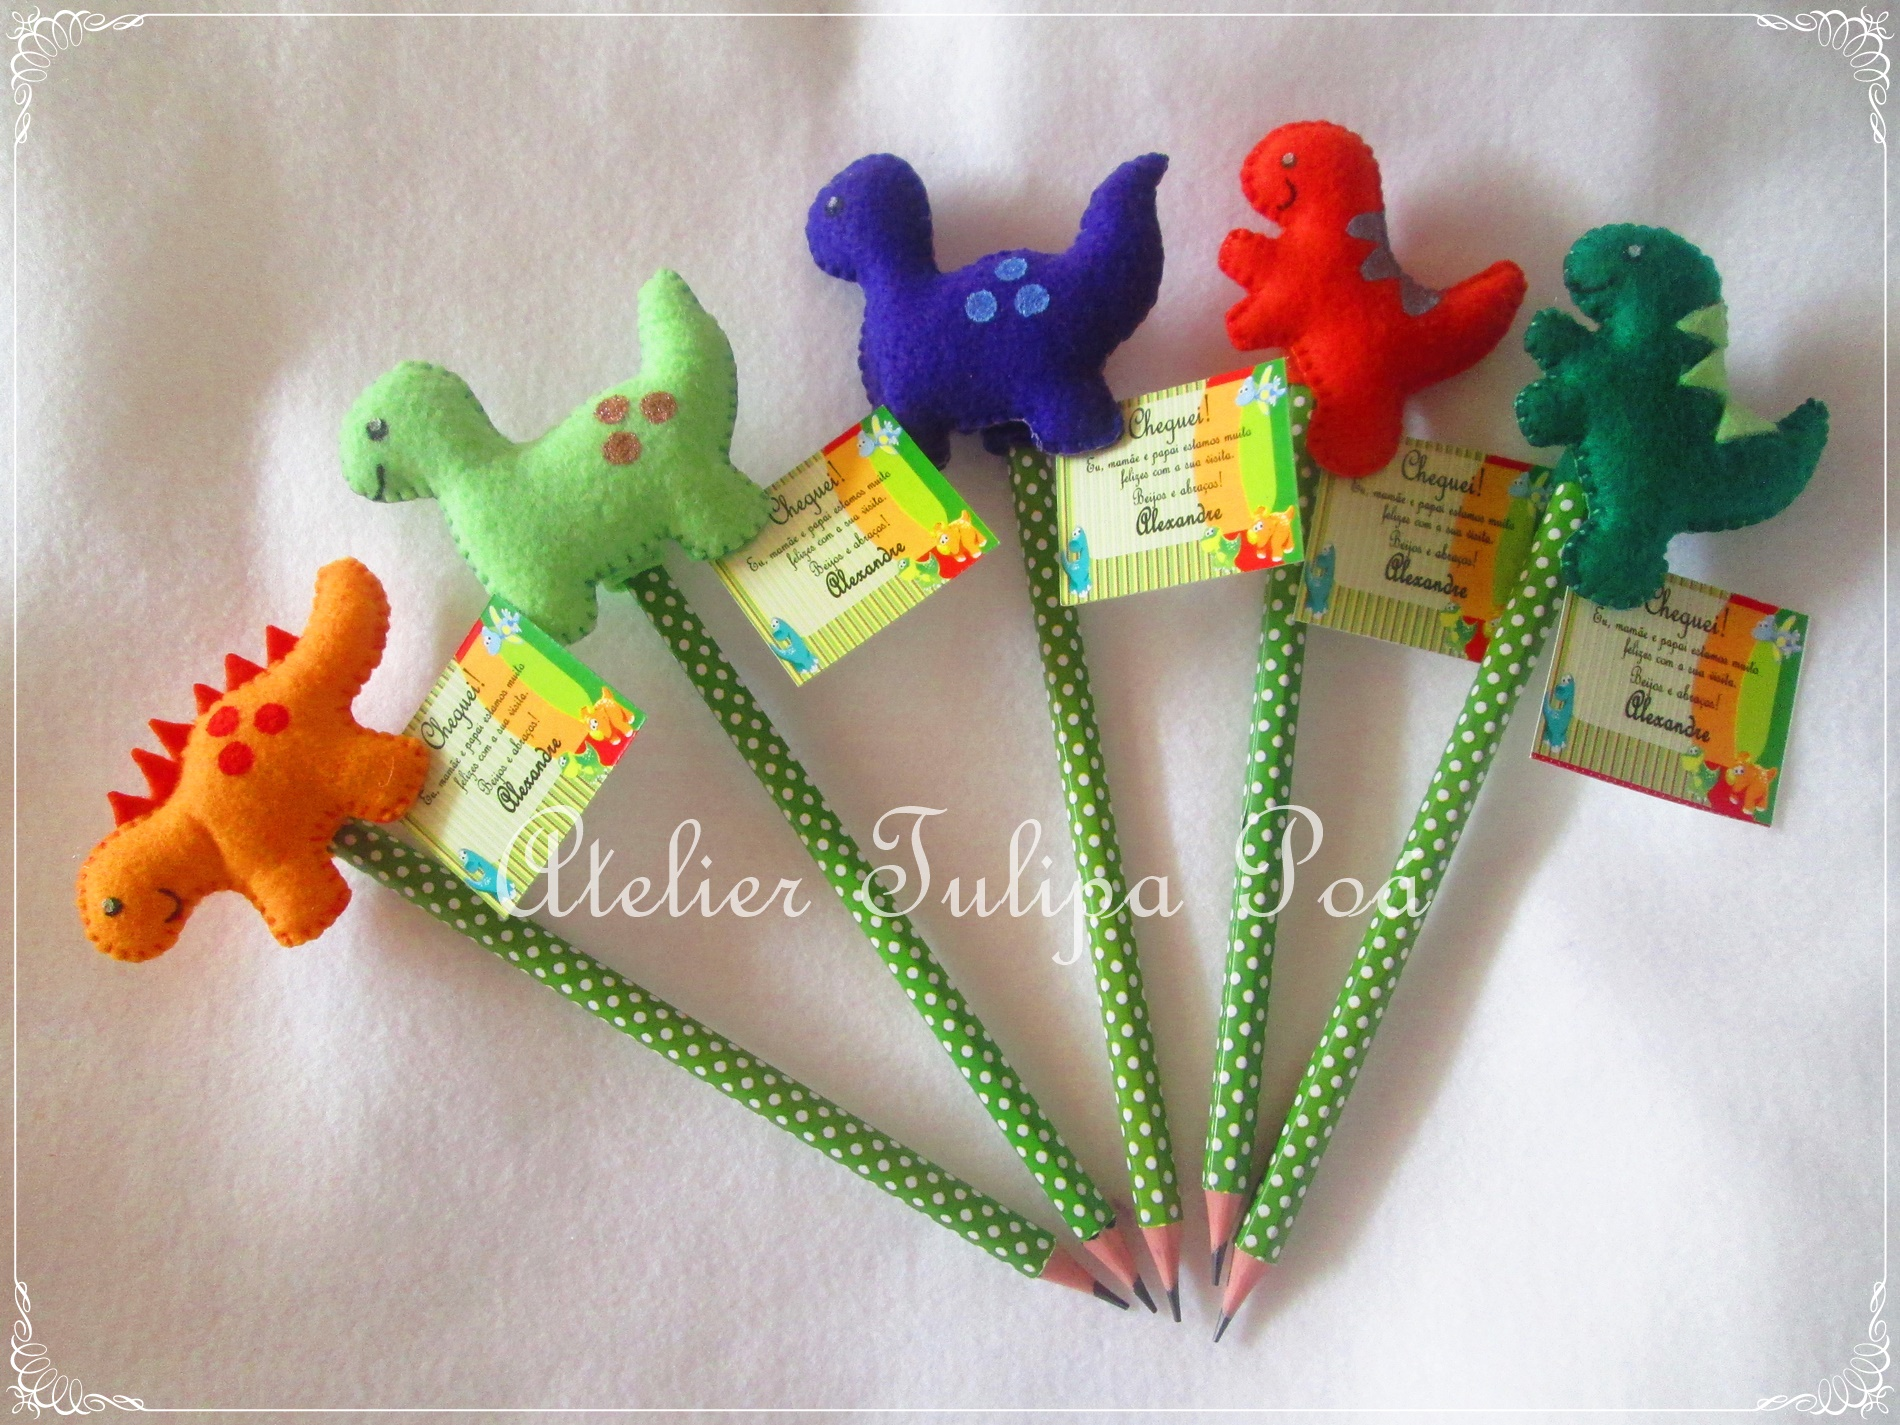 Diana Moura Biscuit: Lembrancinhas dinossauros em biscuit